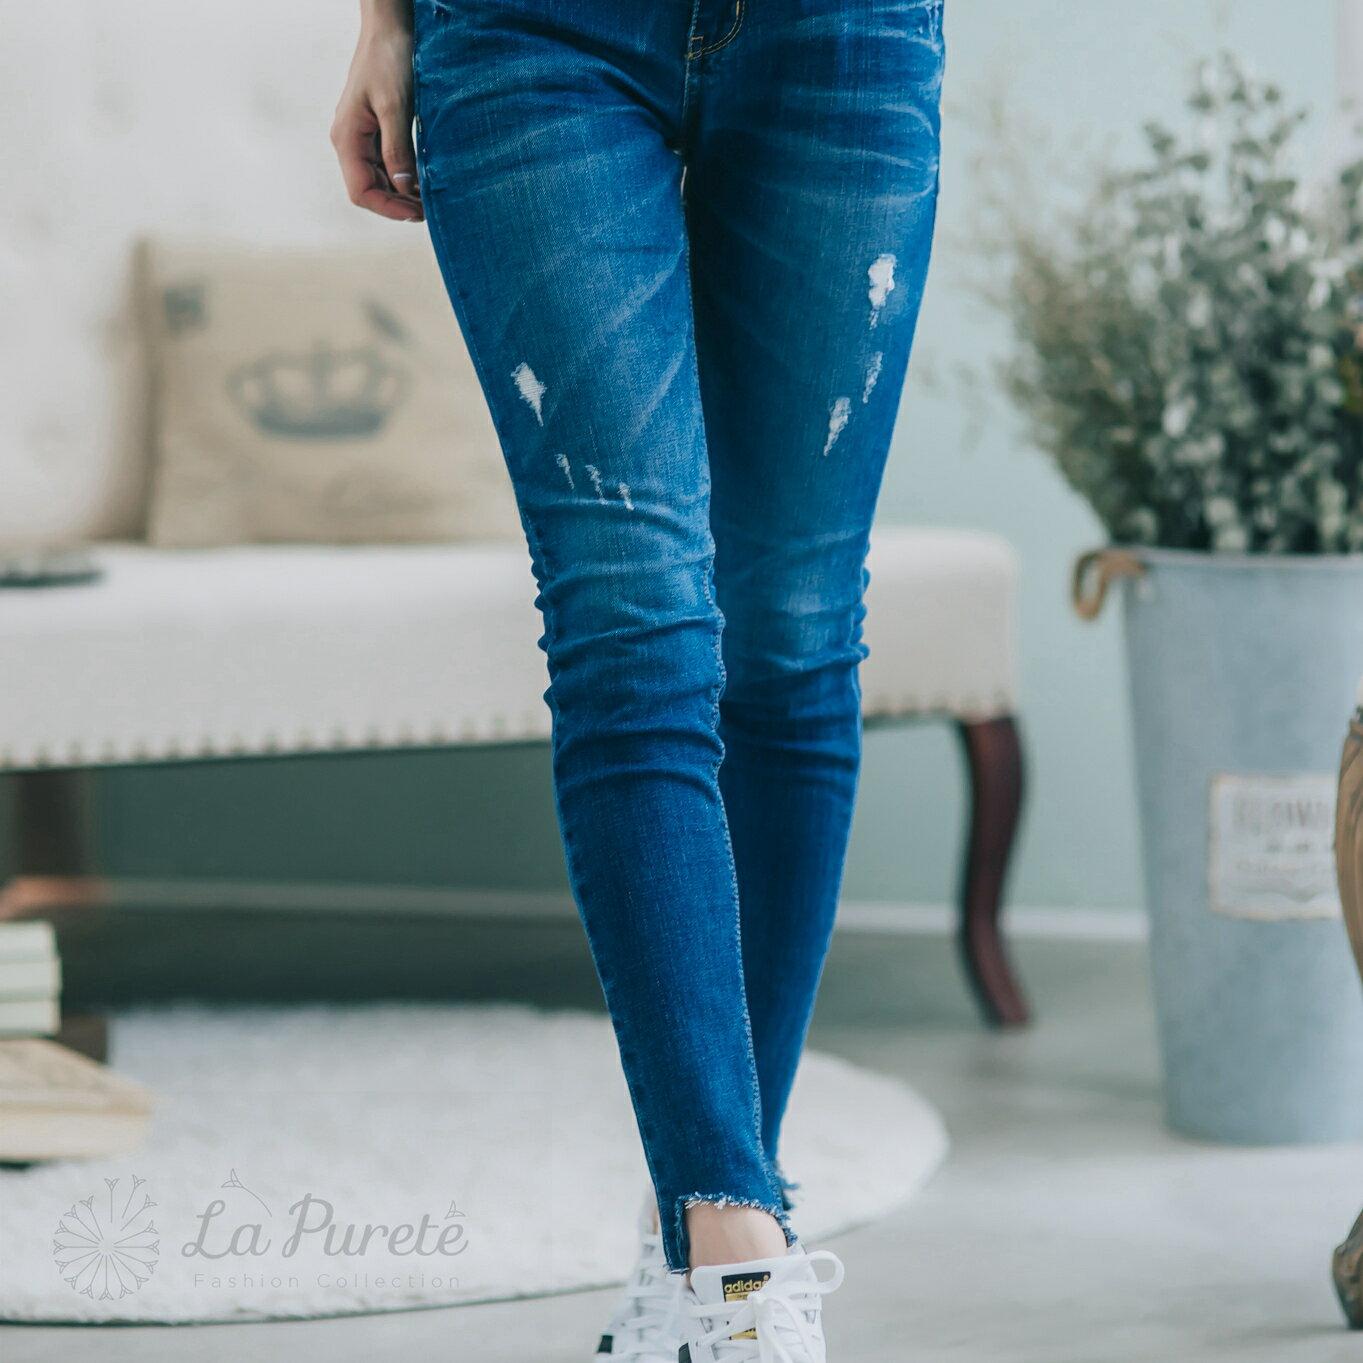 La Purete蕾菲爾【斜缺口造型牛仔褲】16B0004